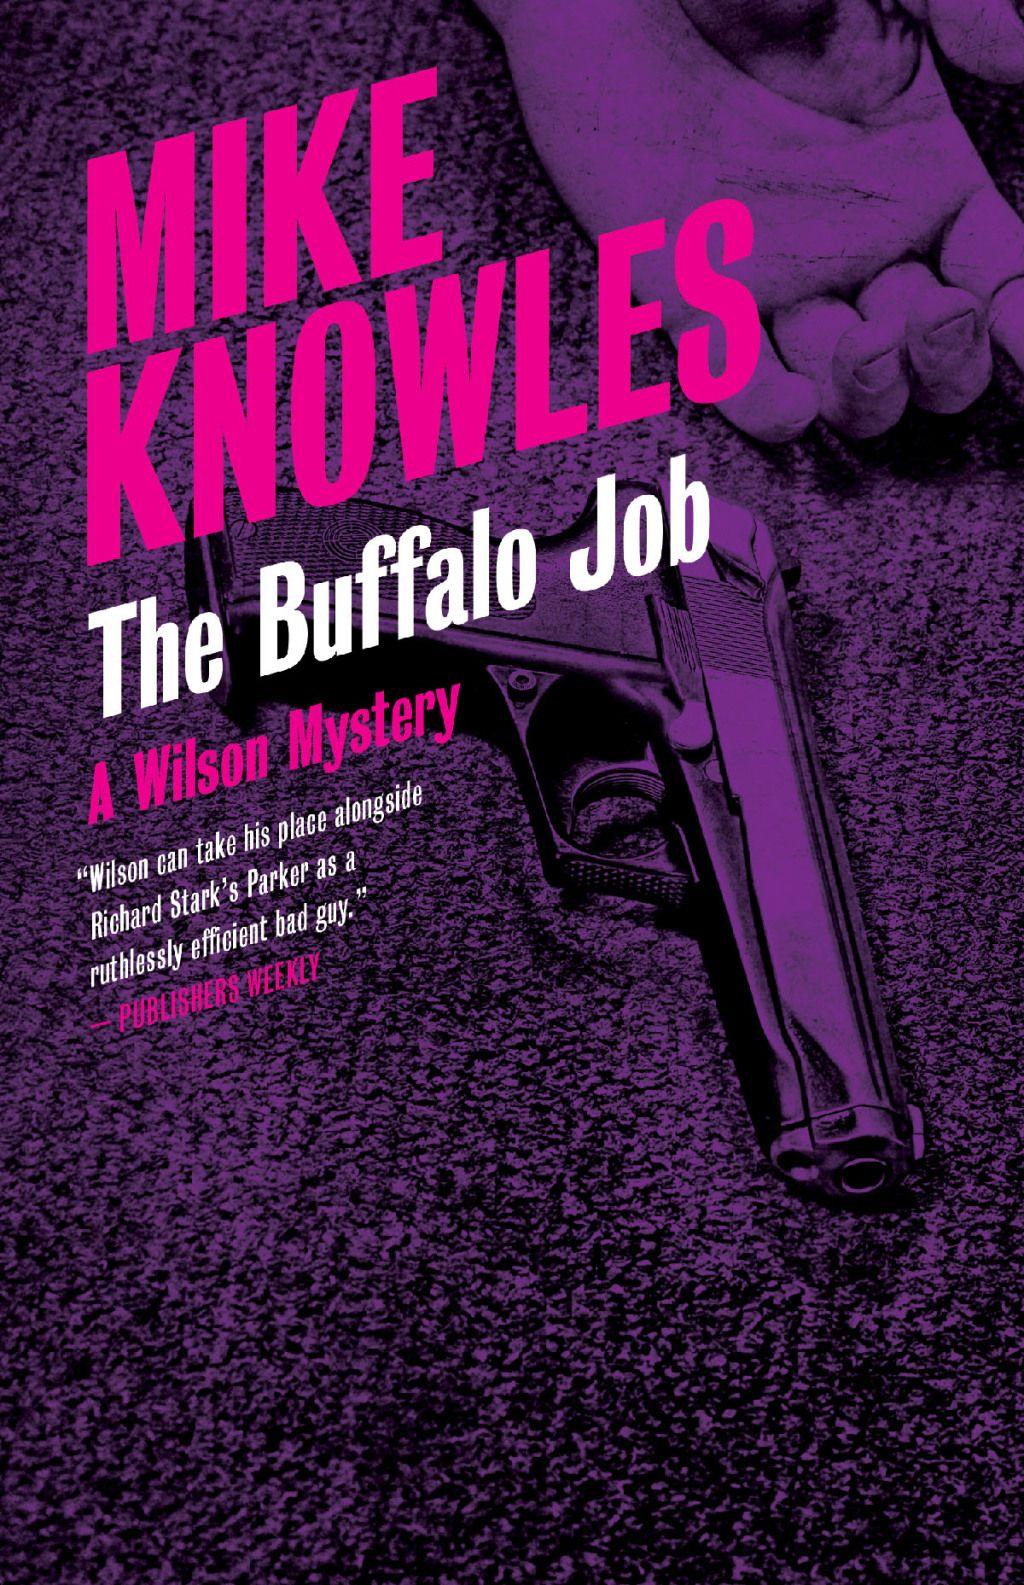 The Buffalo Job (eBook) Job ads, Books, This book